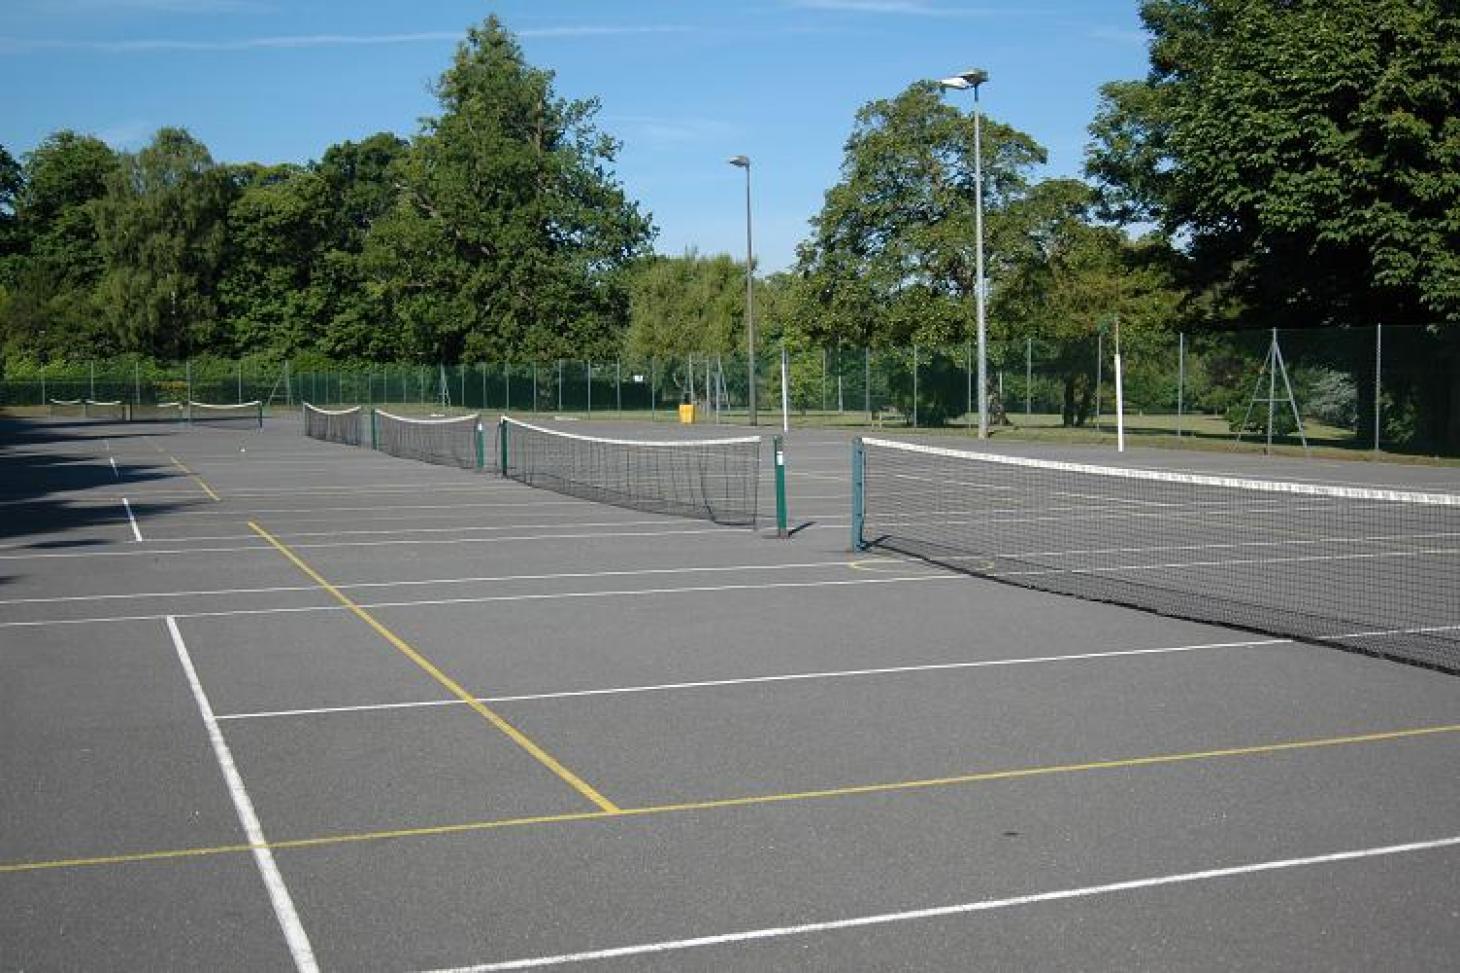 Croydon Sports Club Outdoor | Hard (macadam) netball court